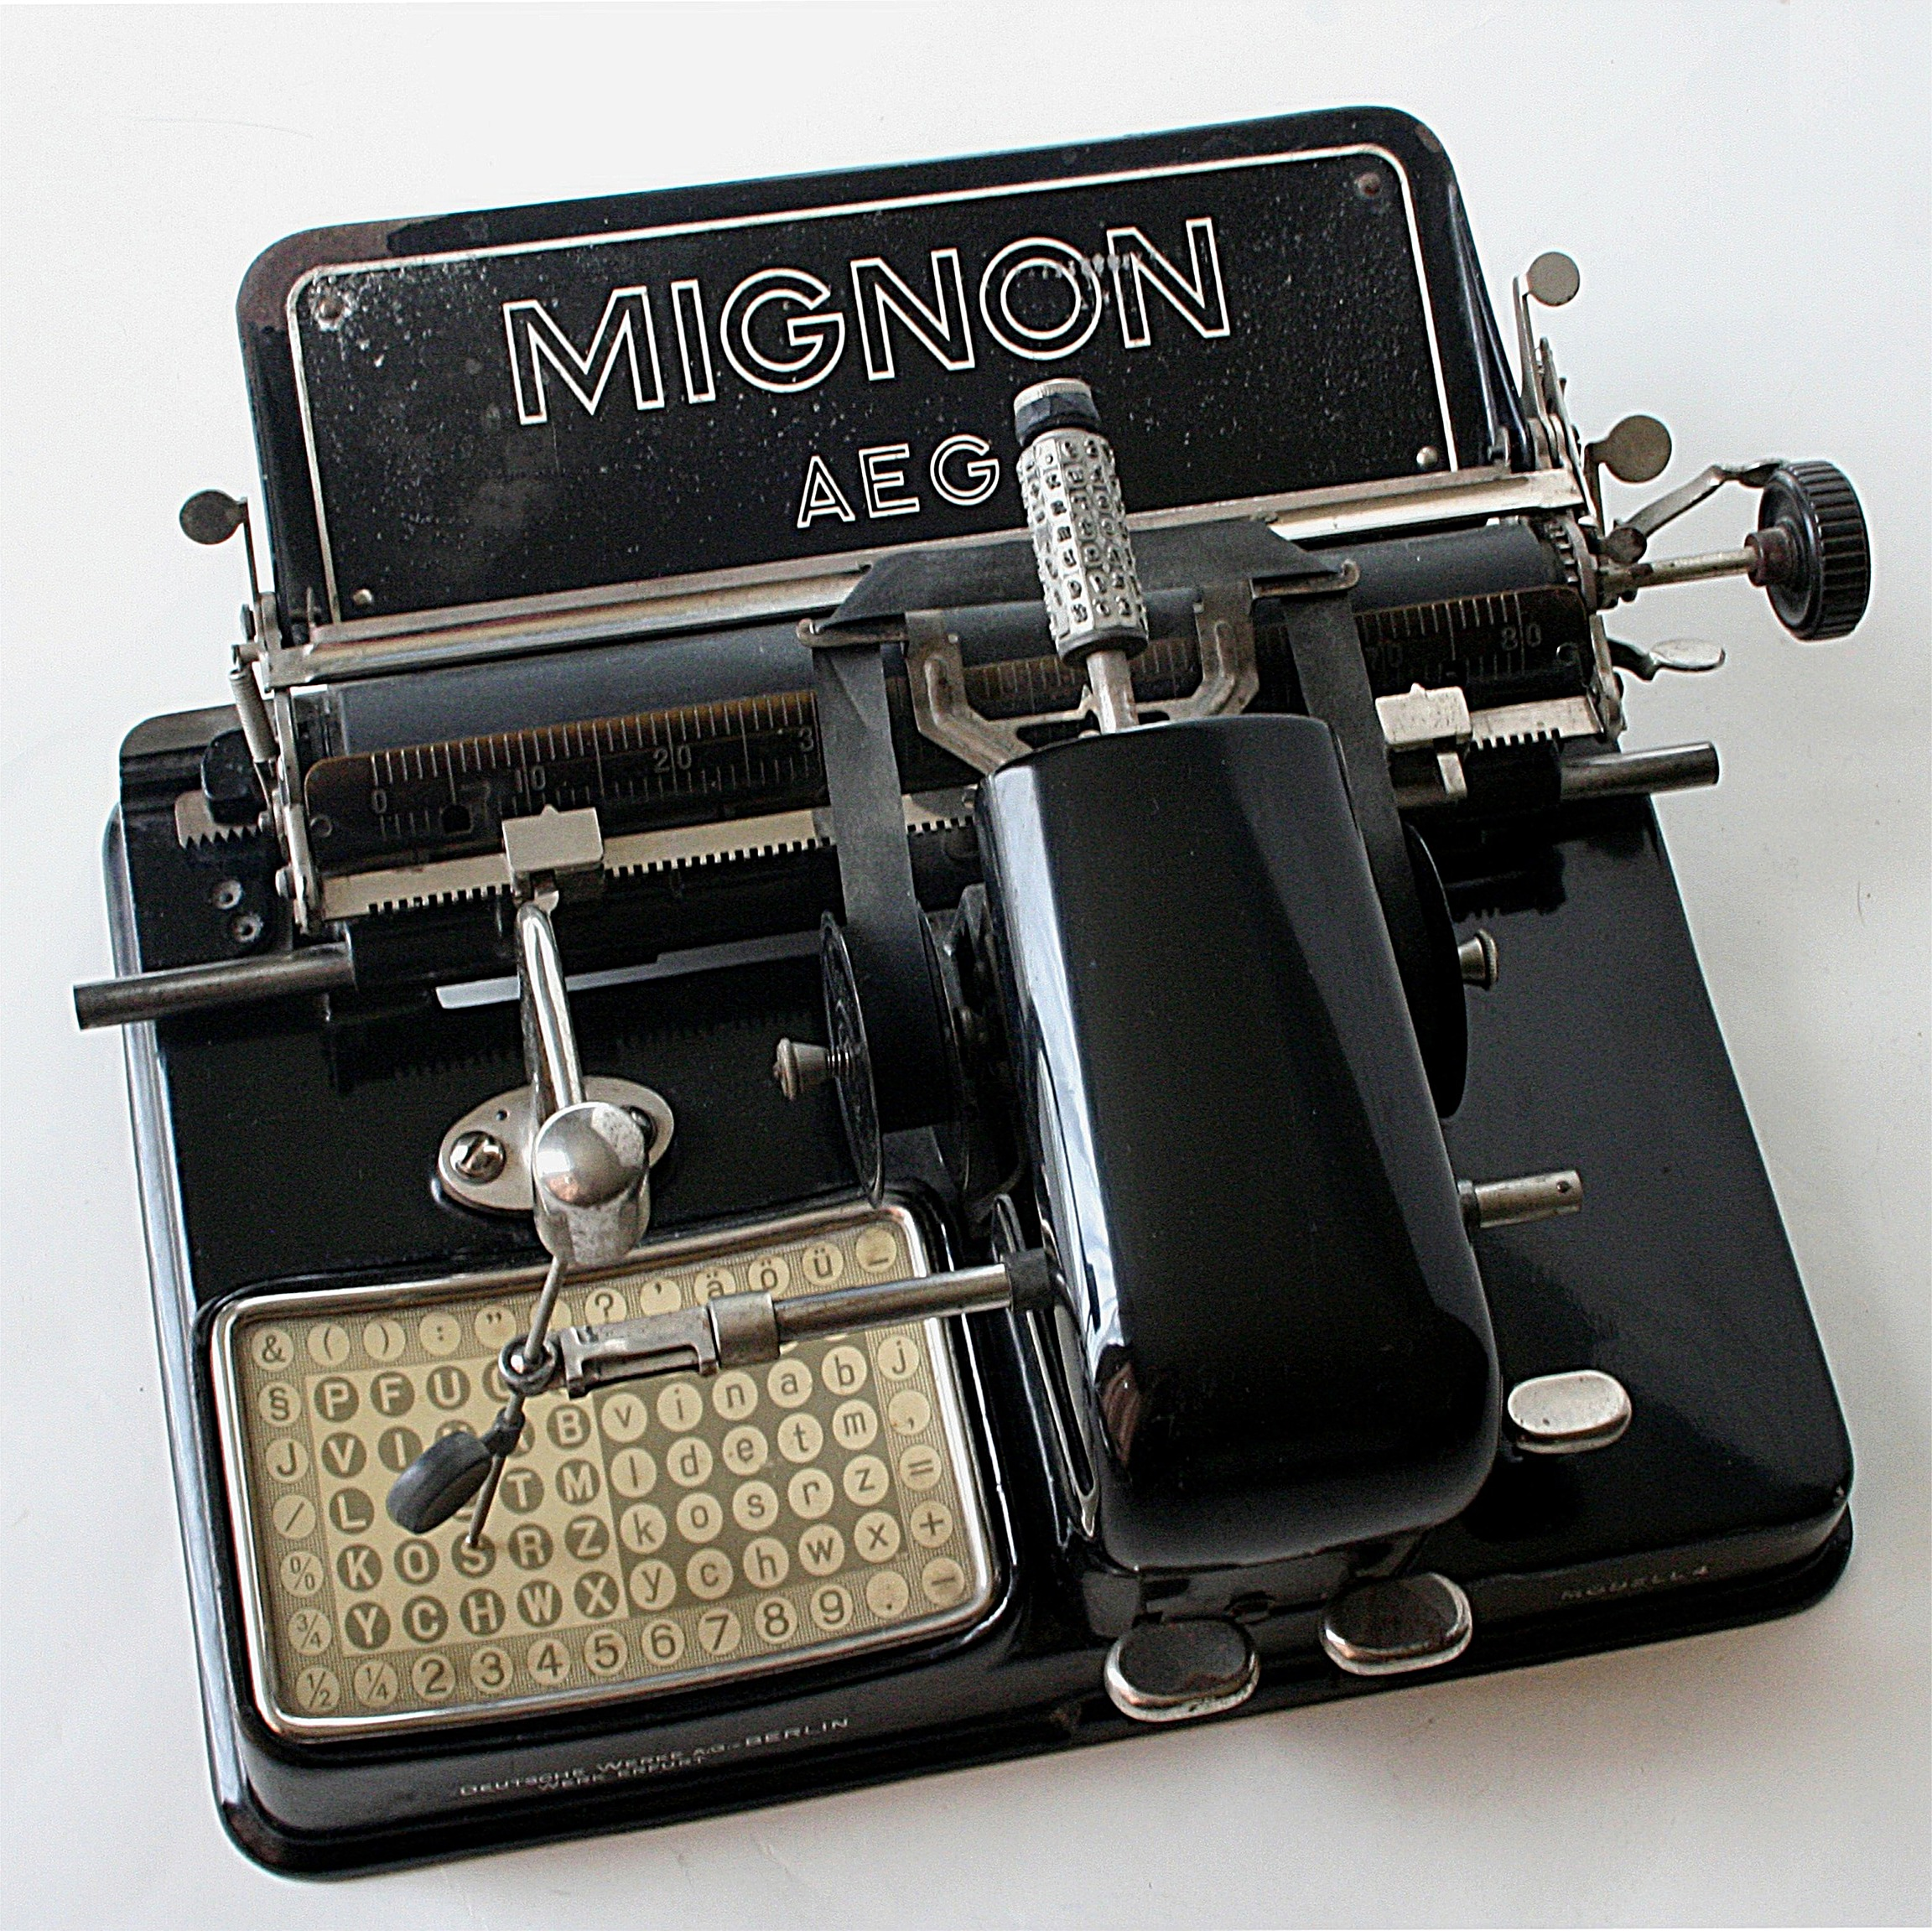 High Resolution Wallpaper | Typewriter 2304x2303 px